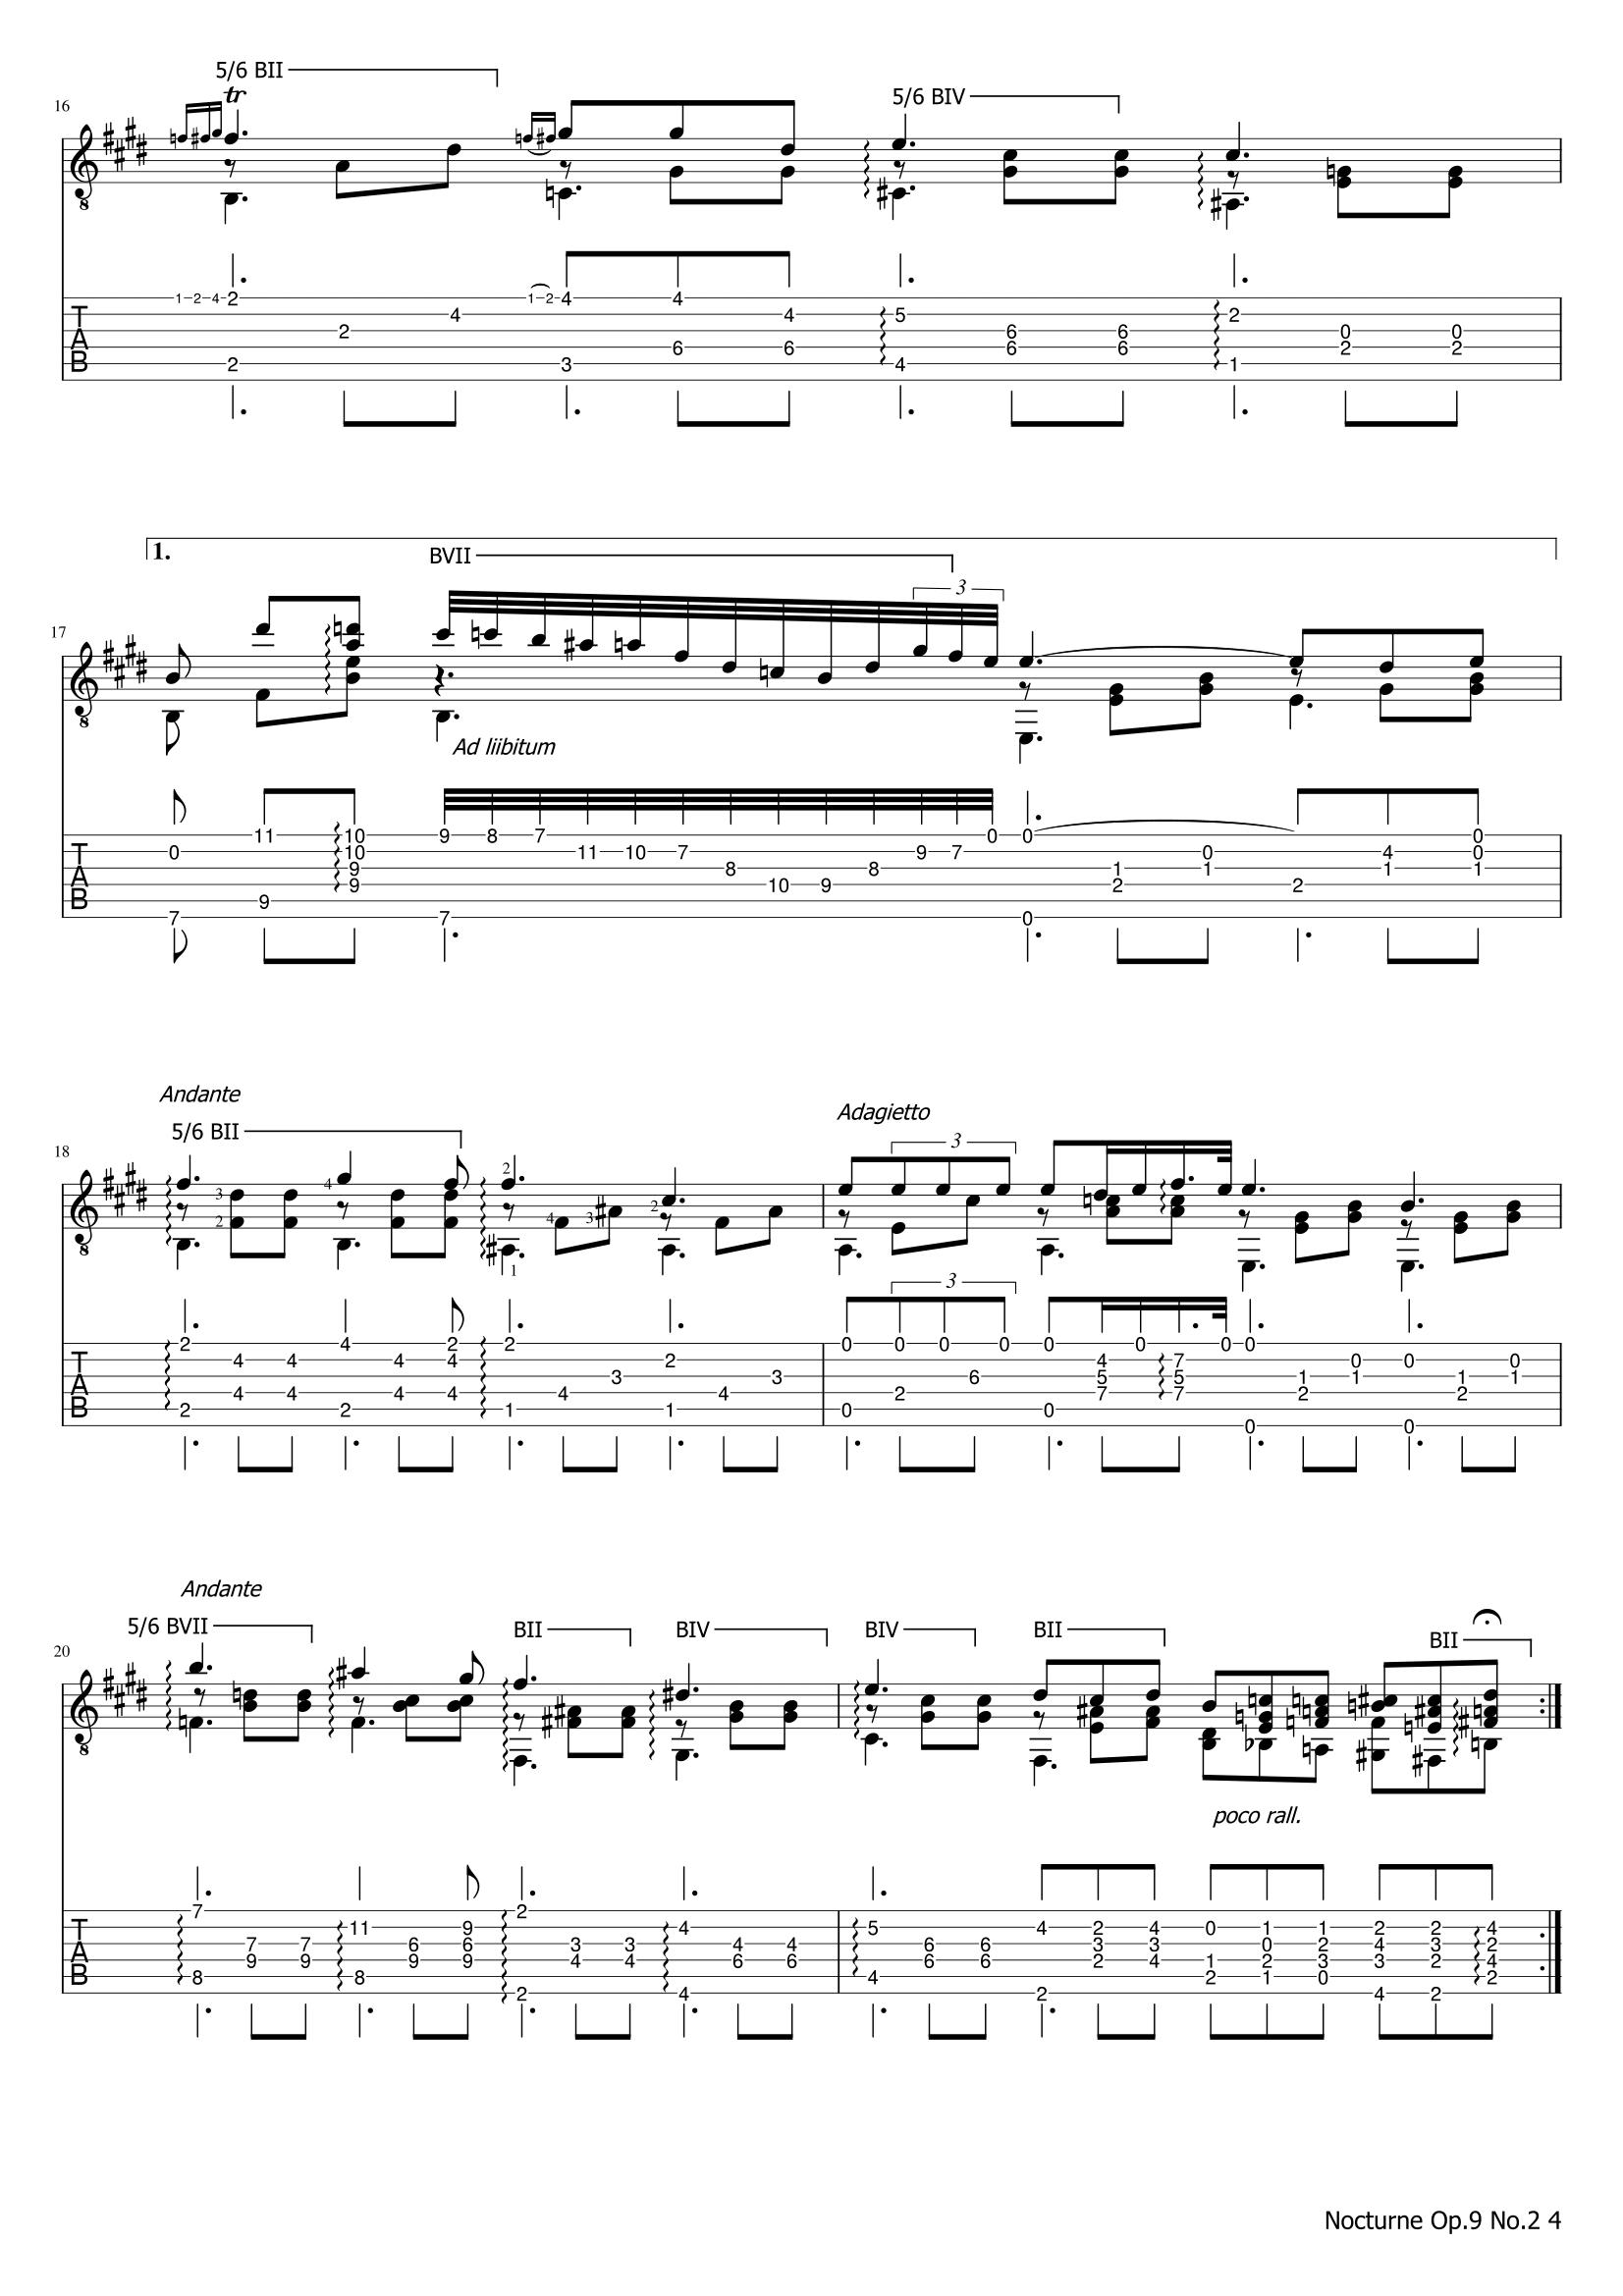 4 - Nocturne Op.9 No.2.png